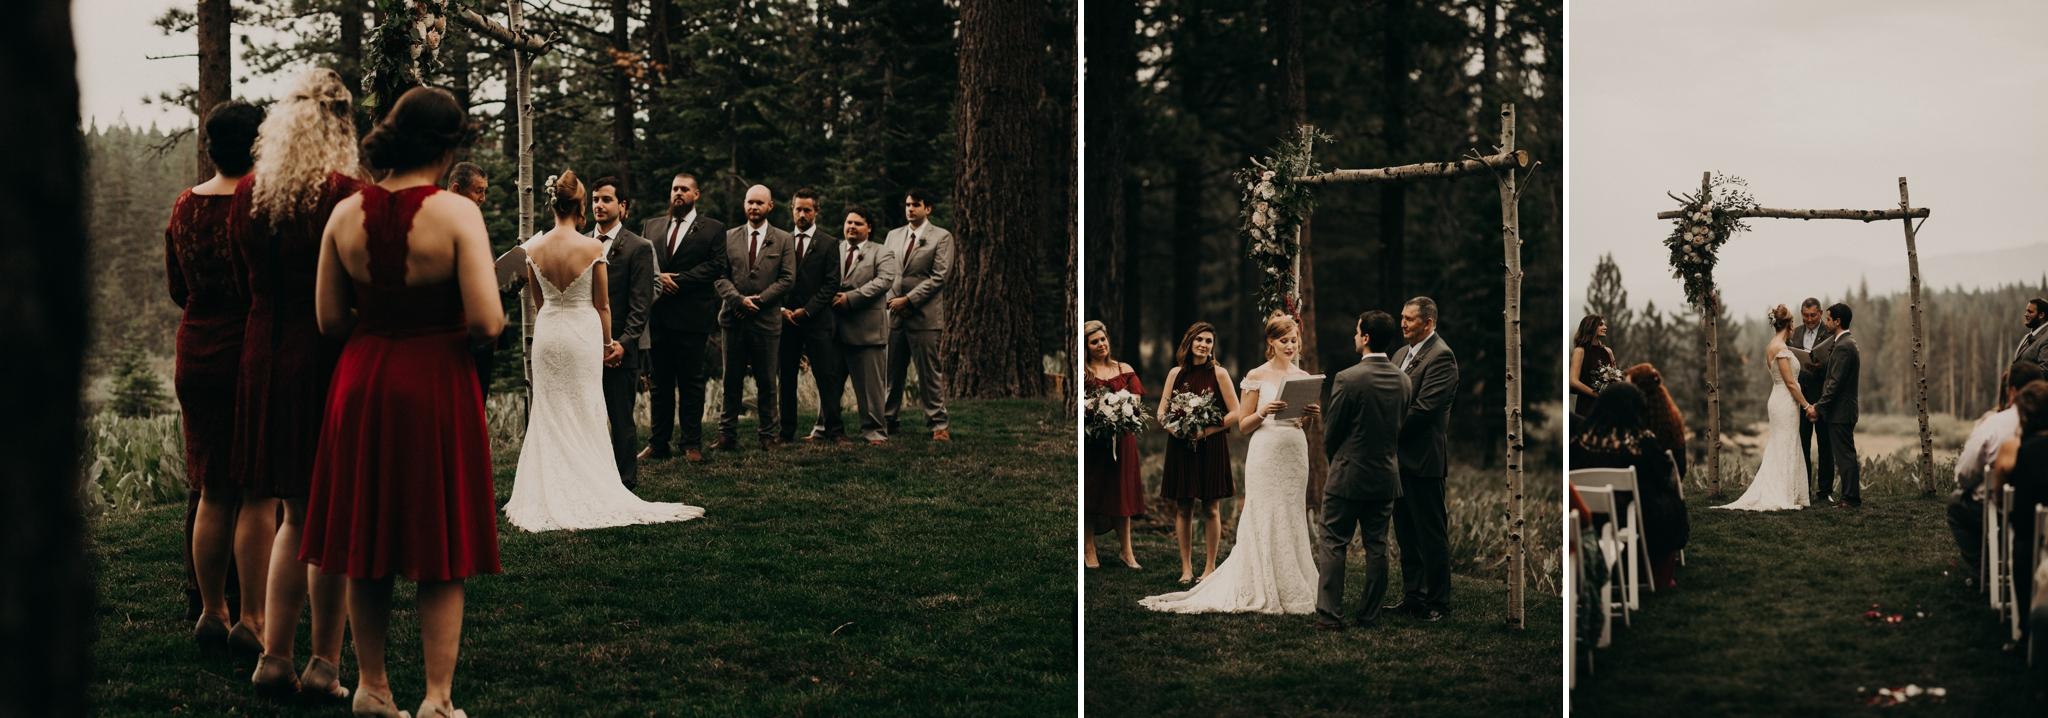 tahoe-wedding-photographer1.jpg